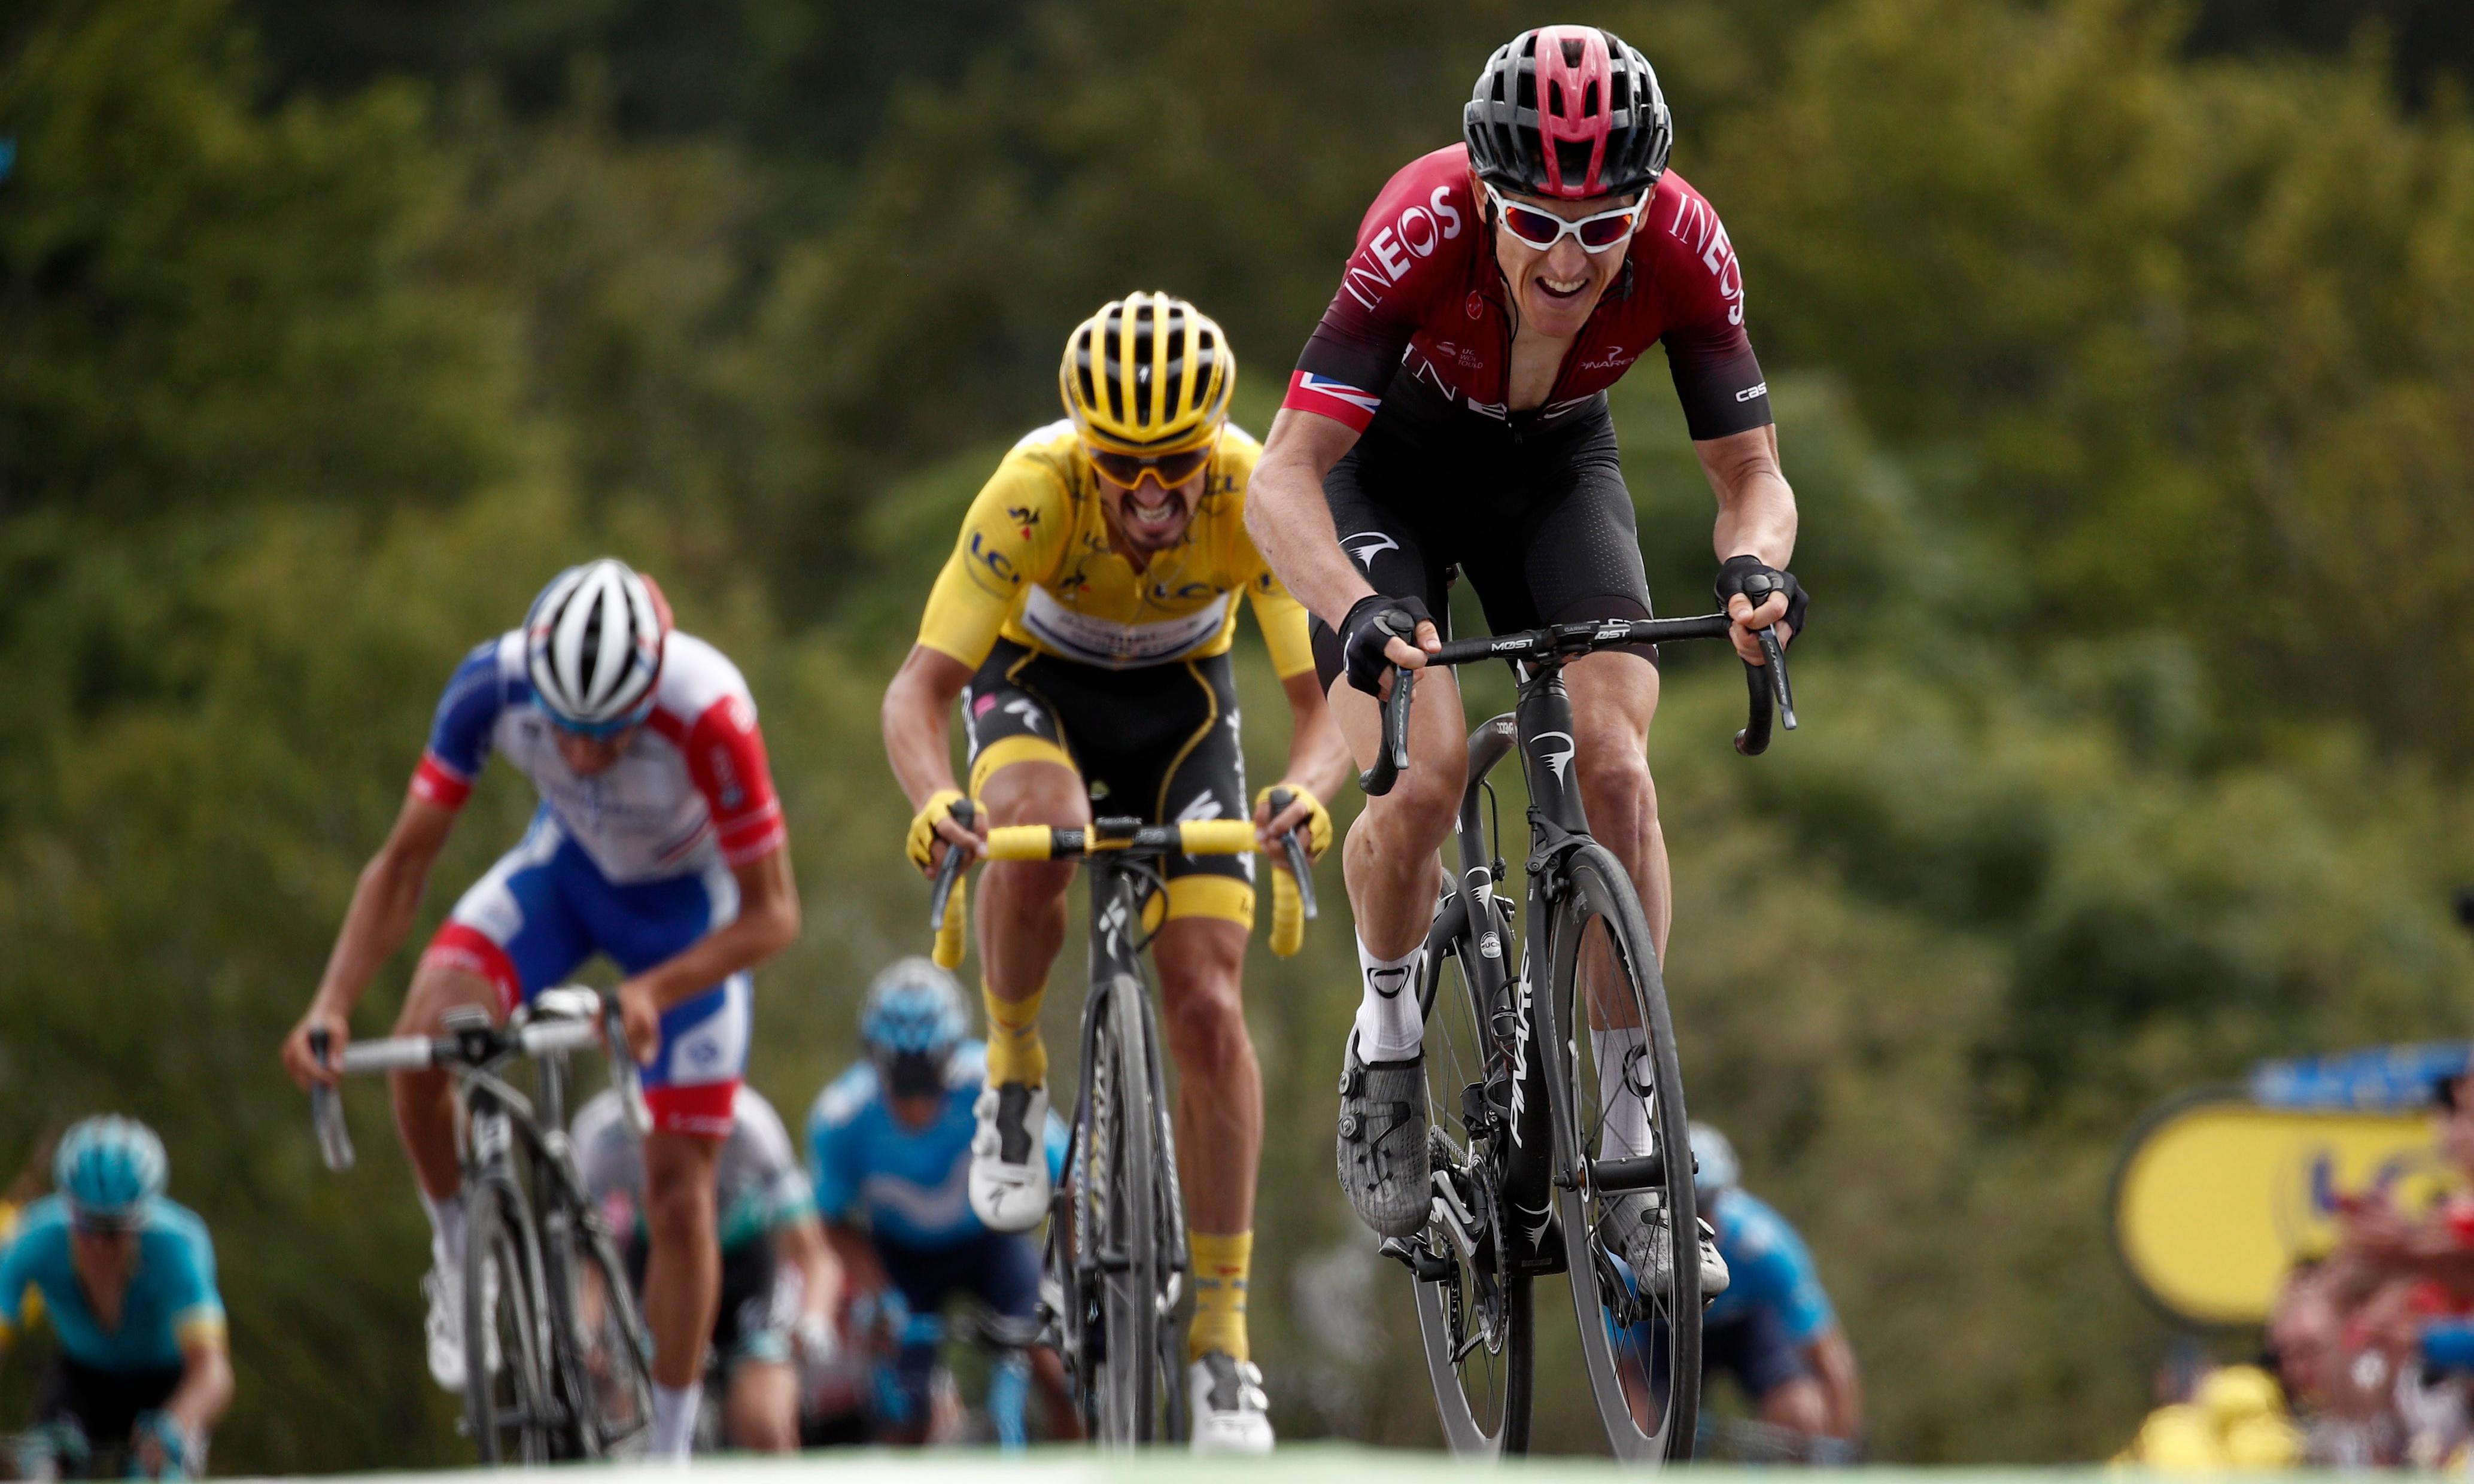 Tour de France: Thomas makes statement but Ciccone takes yellow